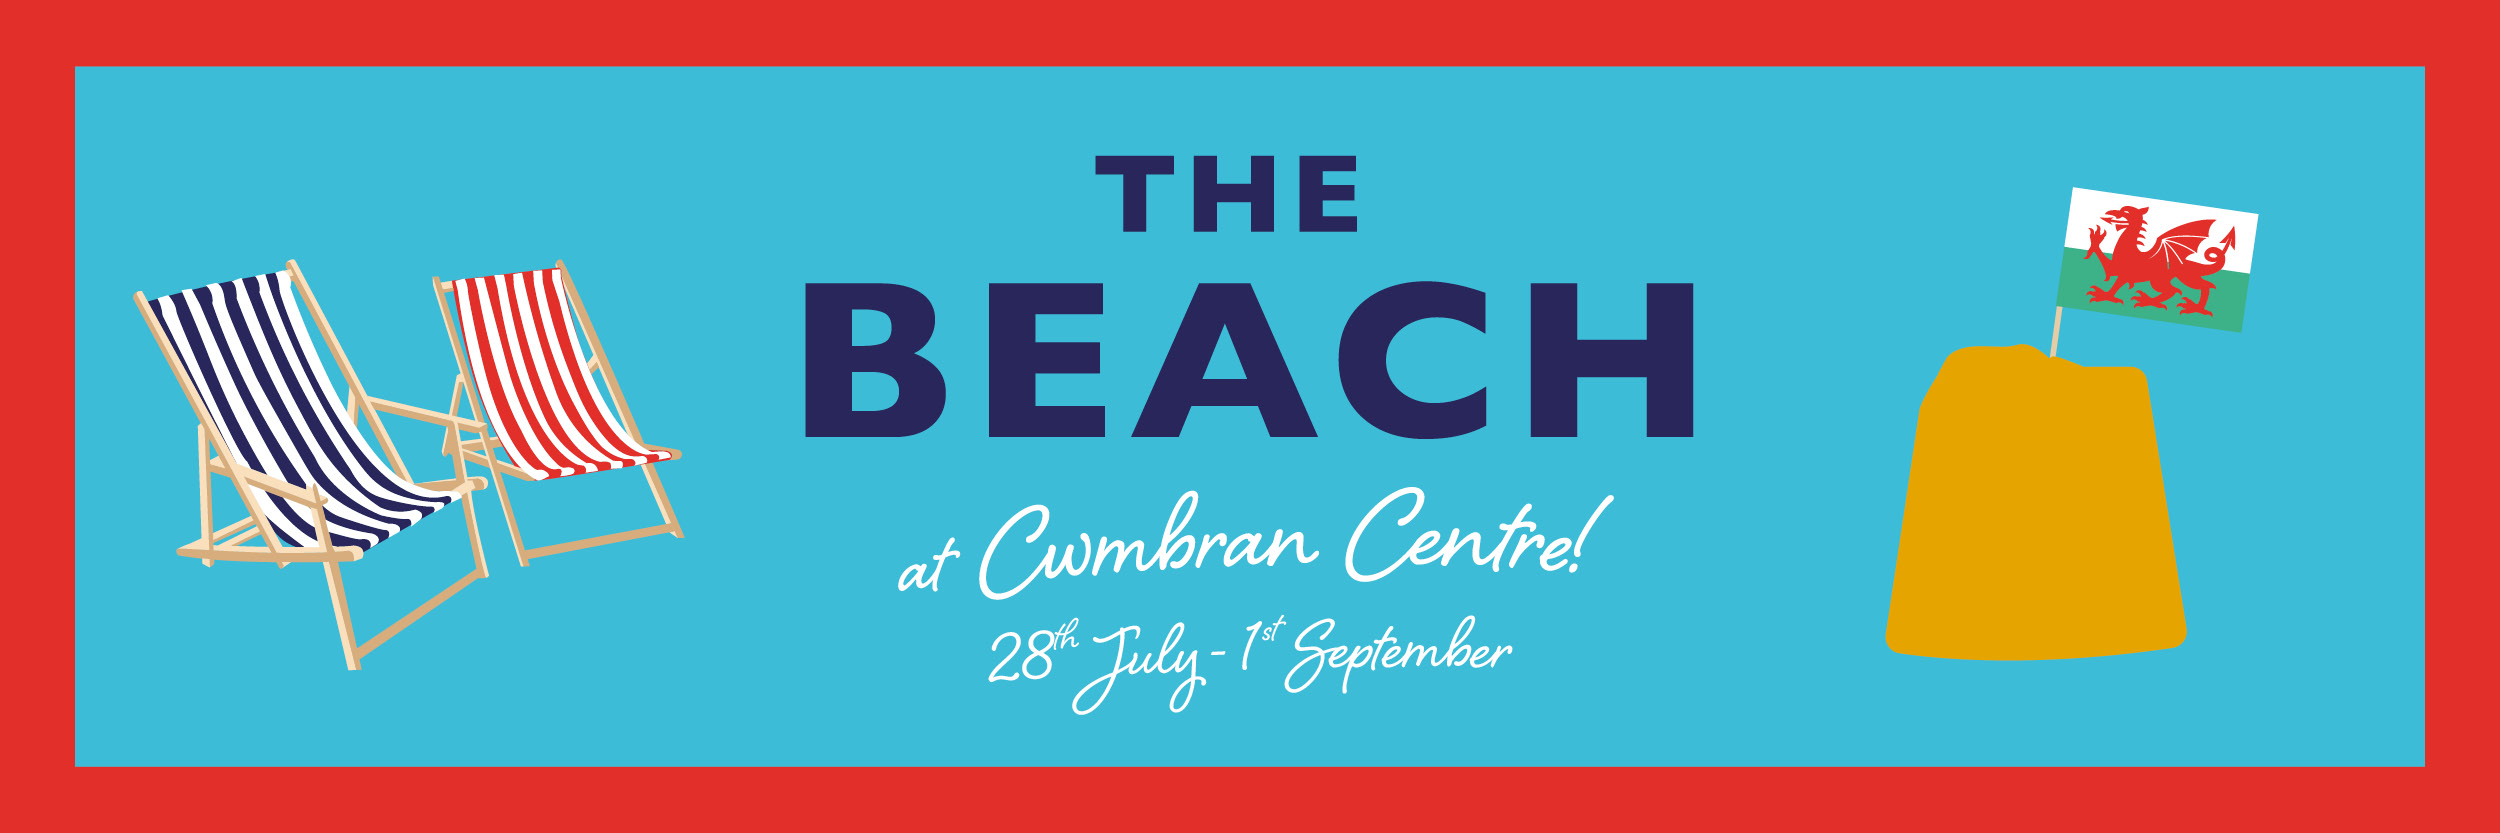 The Beach at Cwmbran Centre